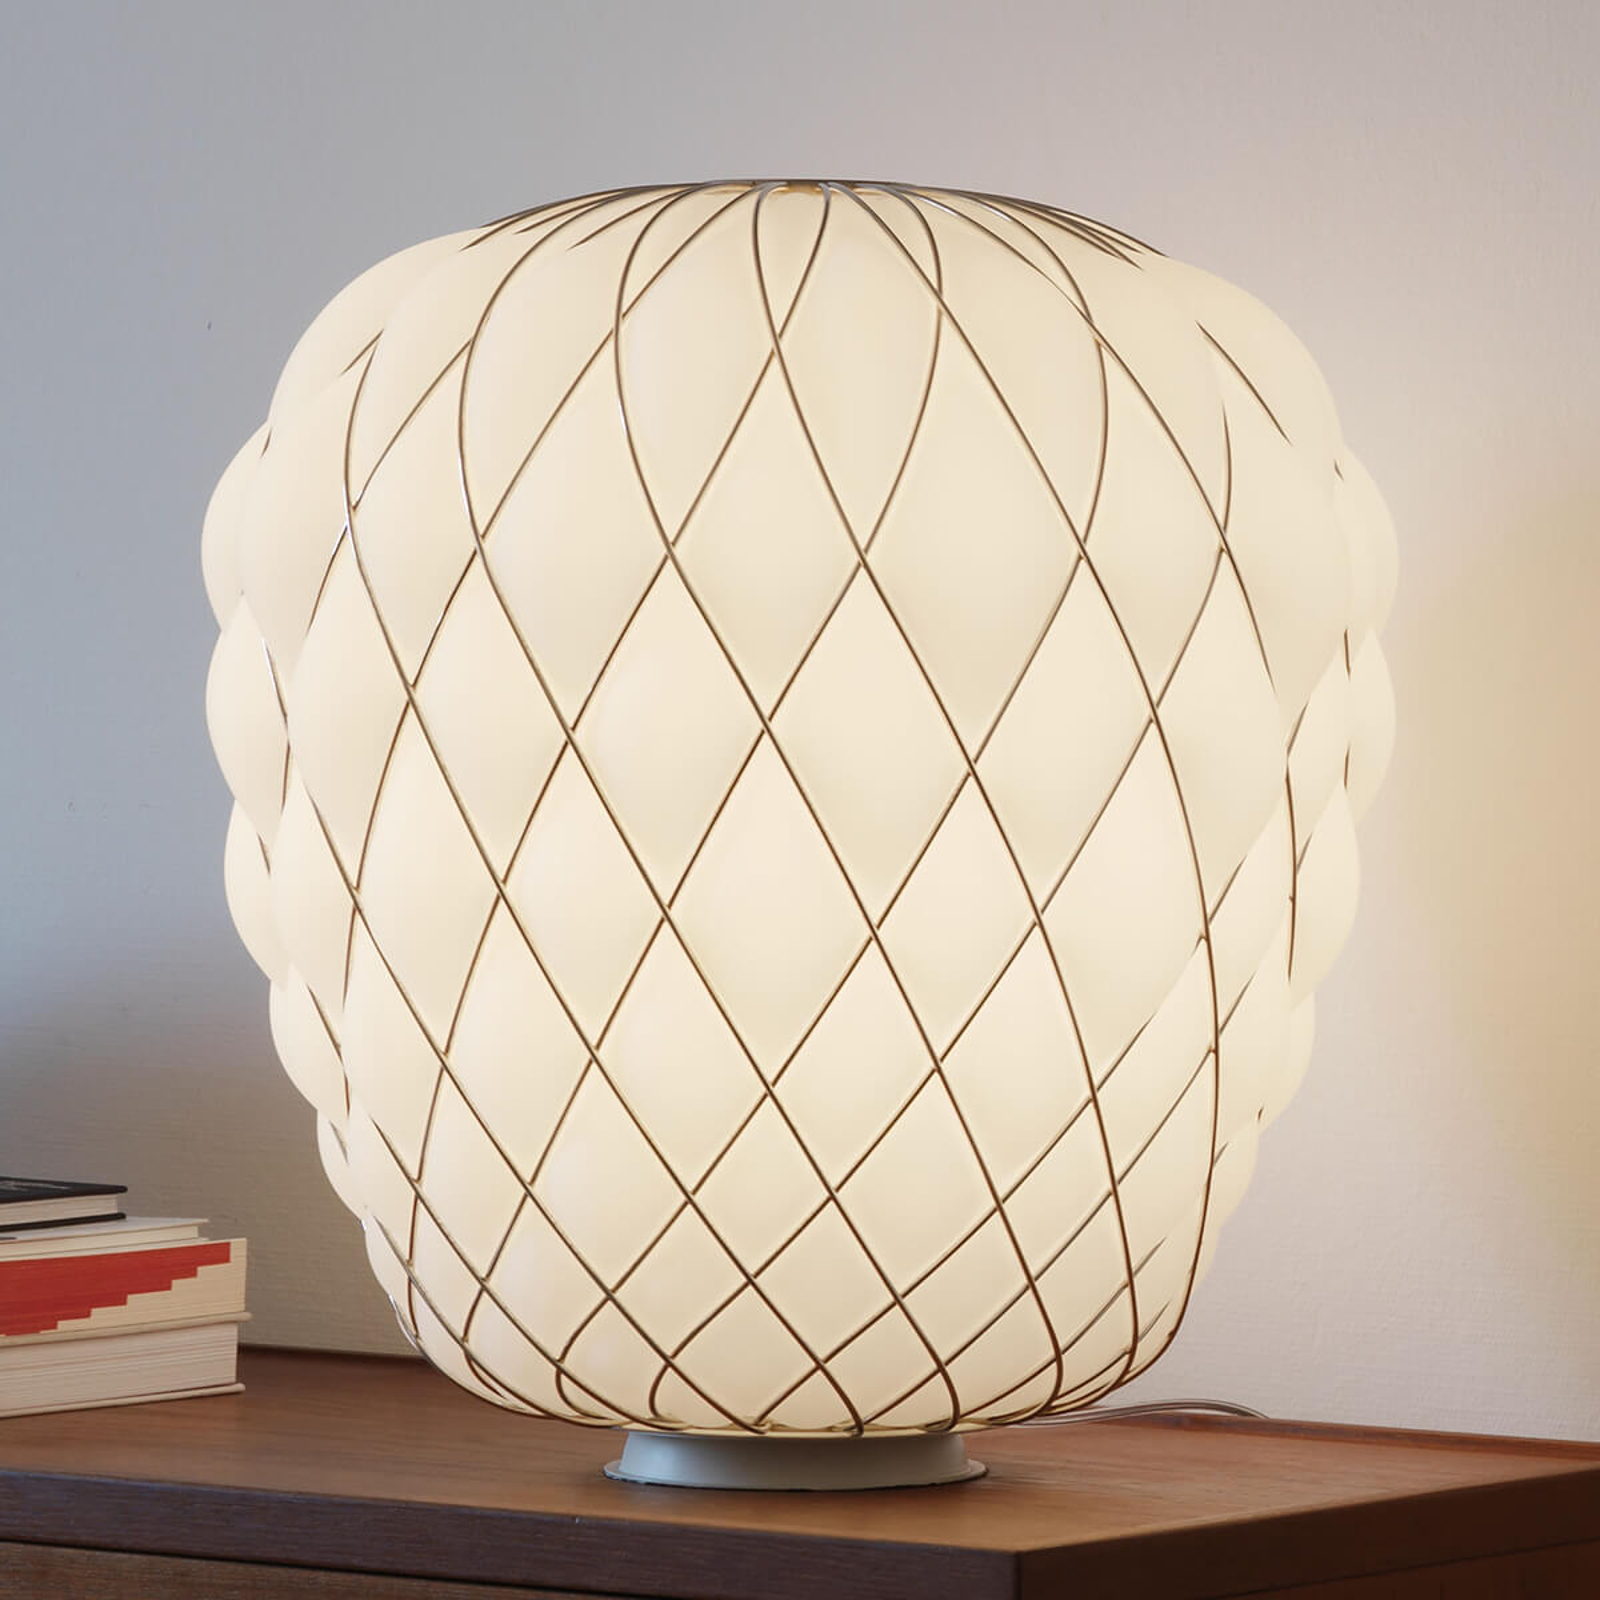 Design tafellamp Pinecone van melkglas